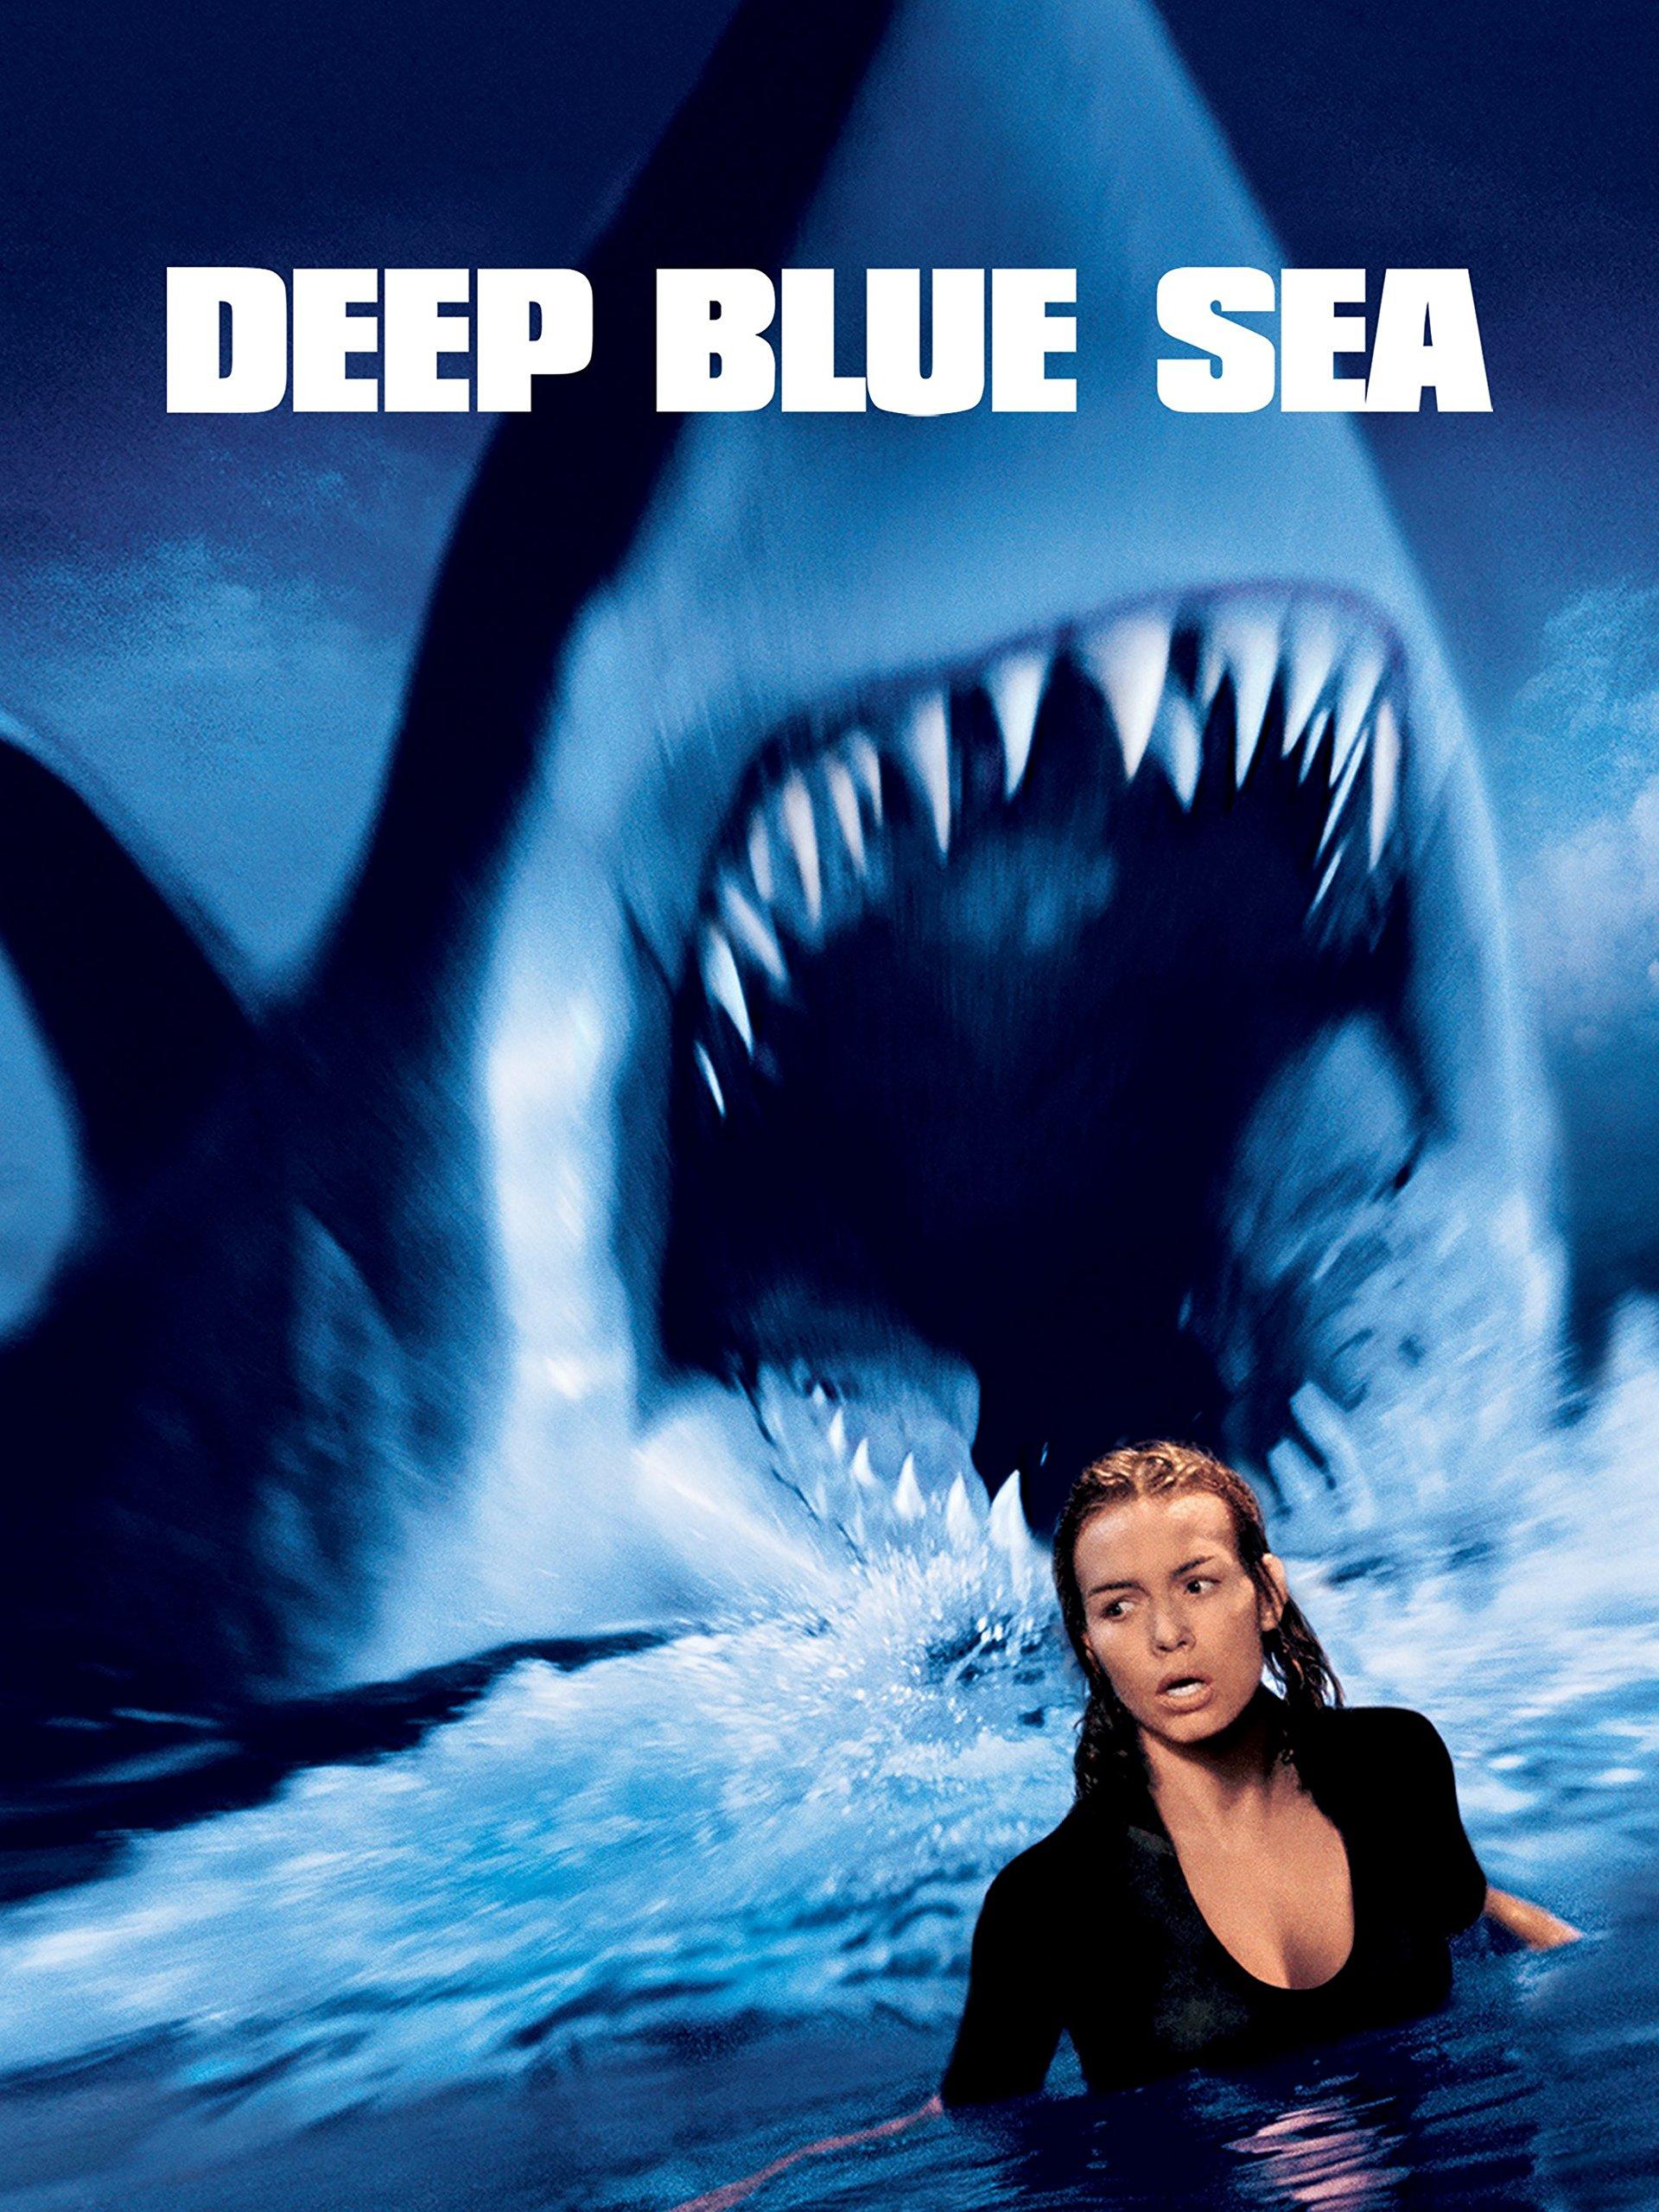 Deep blue sea photo